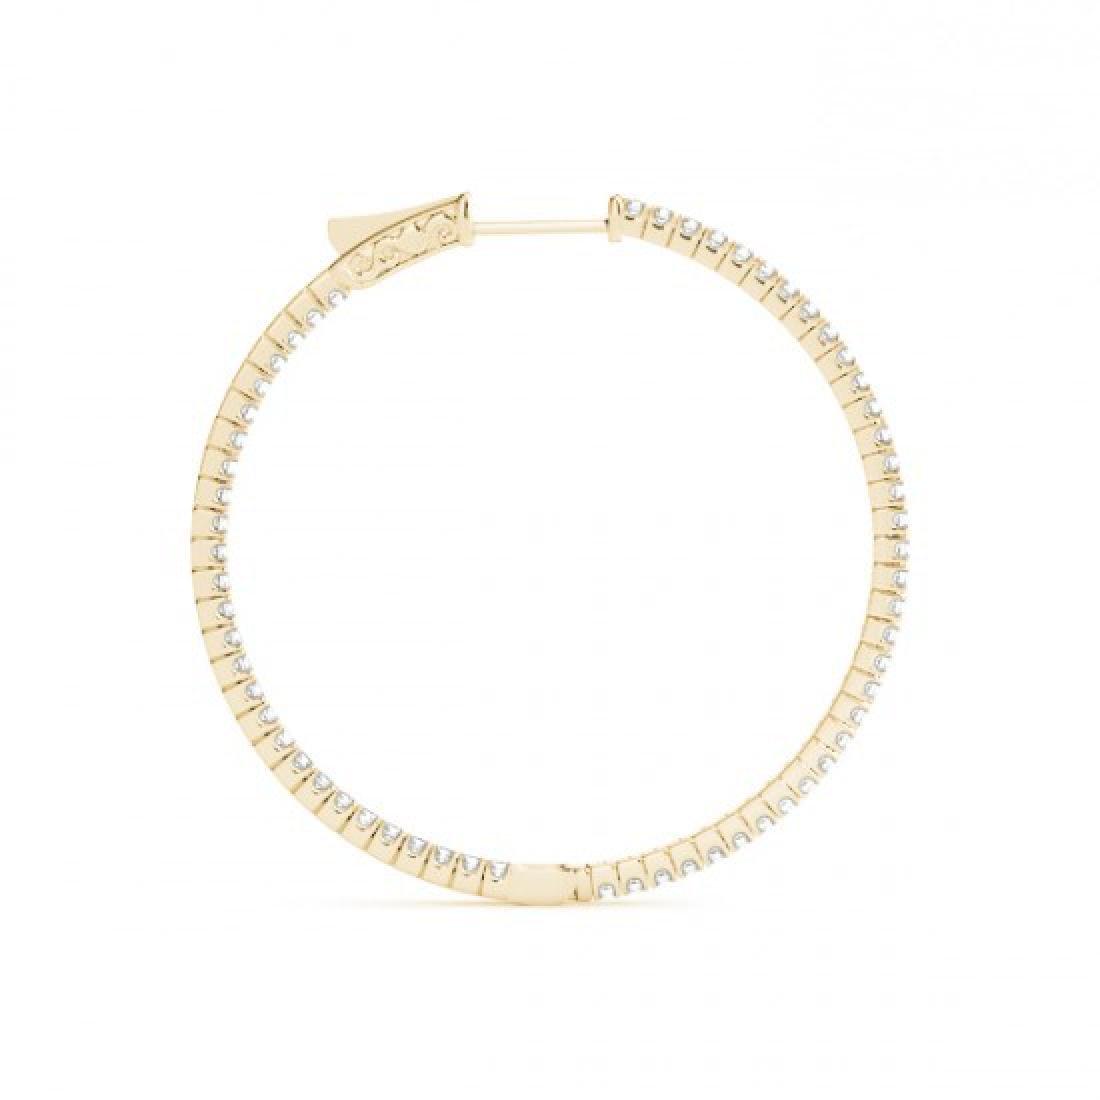 1 CTW Diamond VS/SI Certified 24 Mm Hoop Earrings 14K - 3